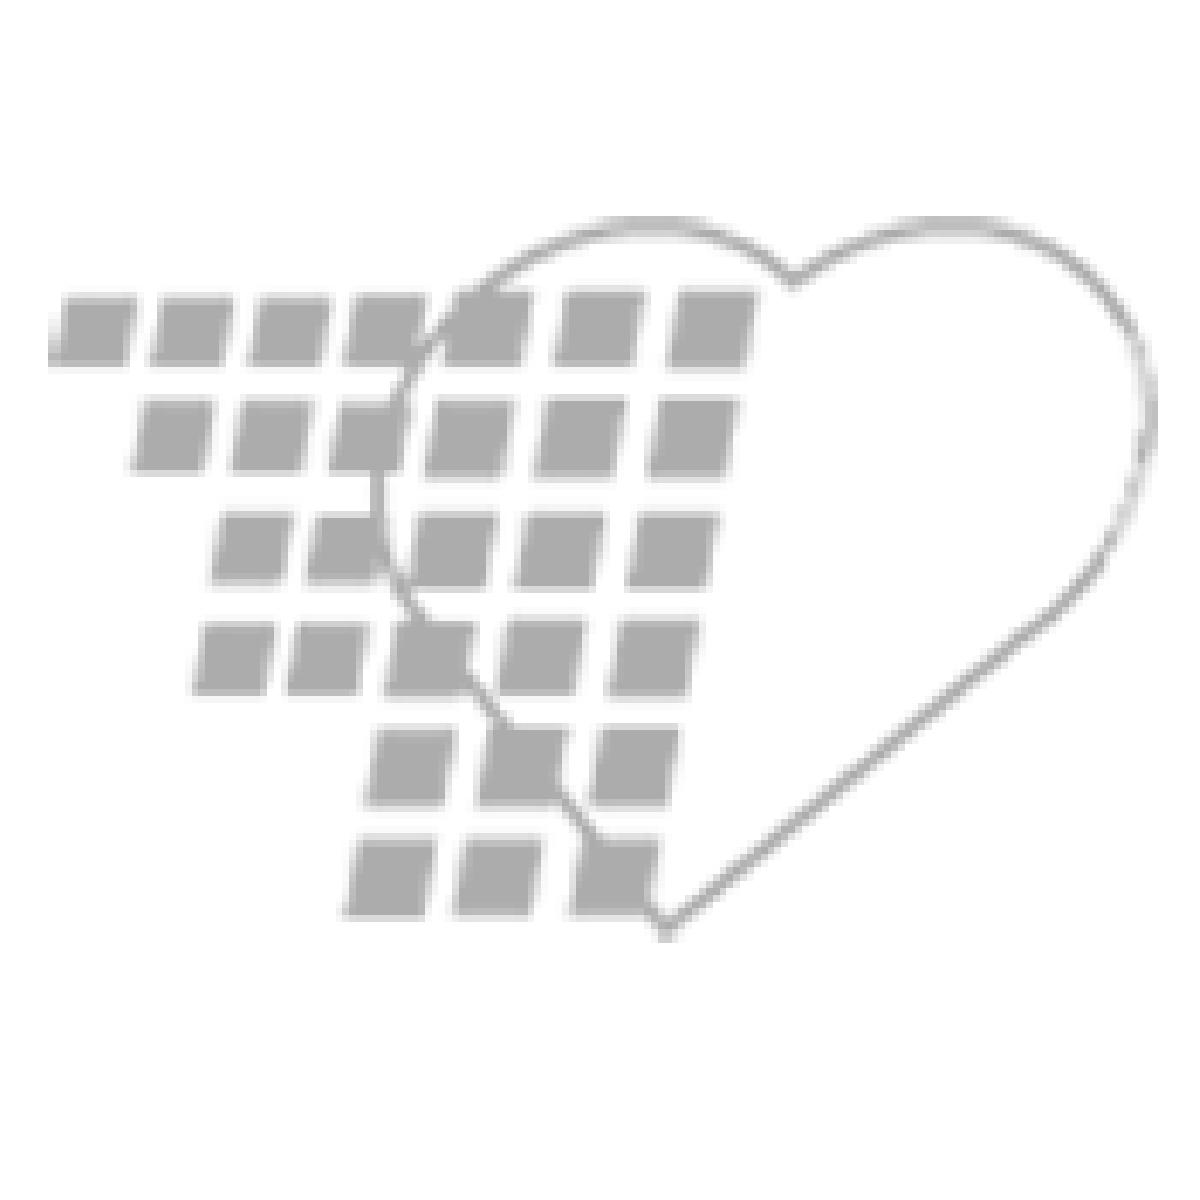 06-93-1439 Demo Dose® Vancomycn 20 mL 1 g/20 mL